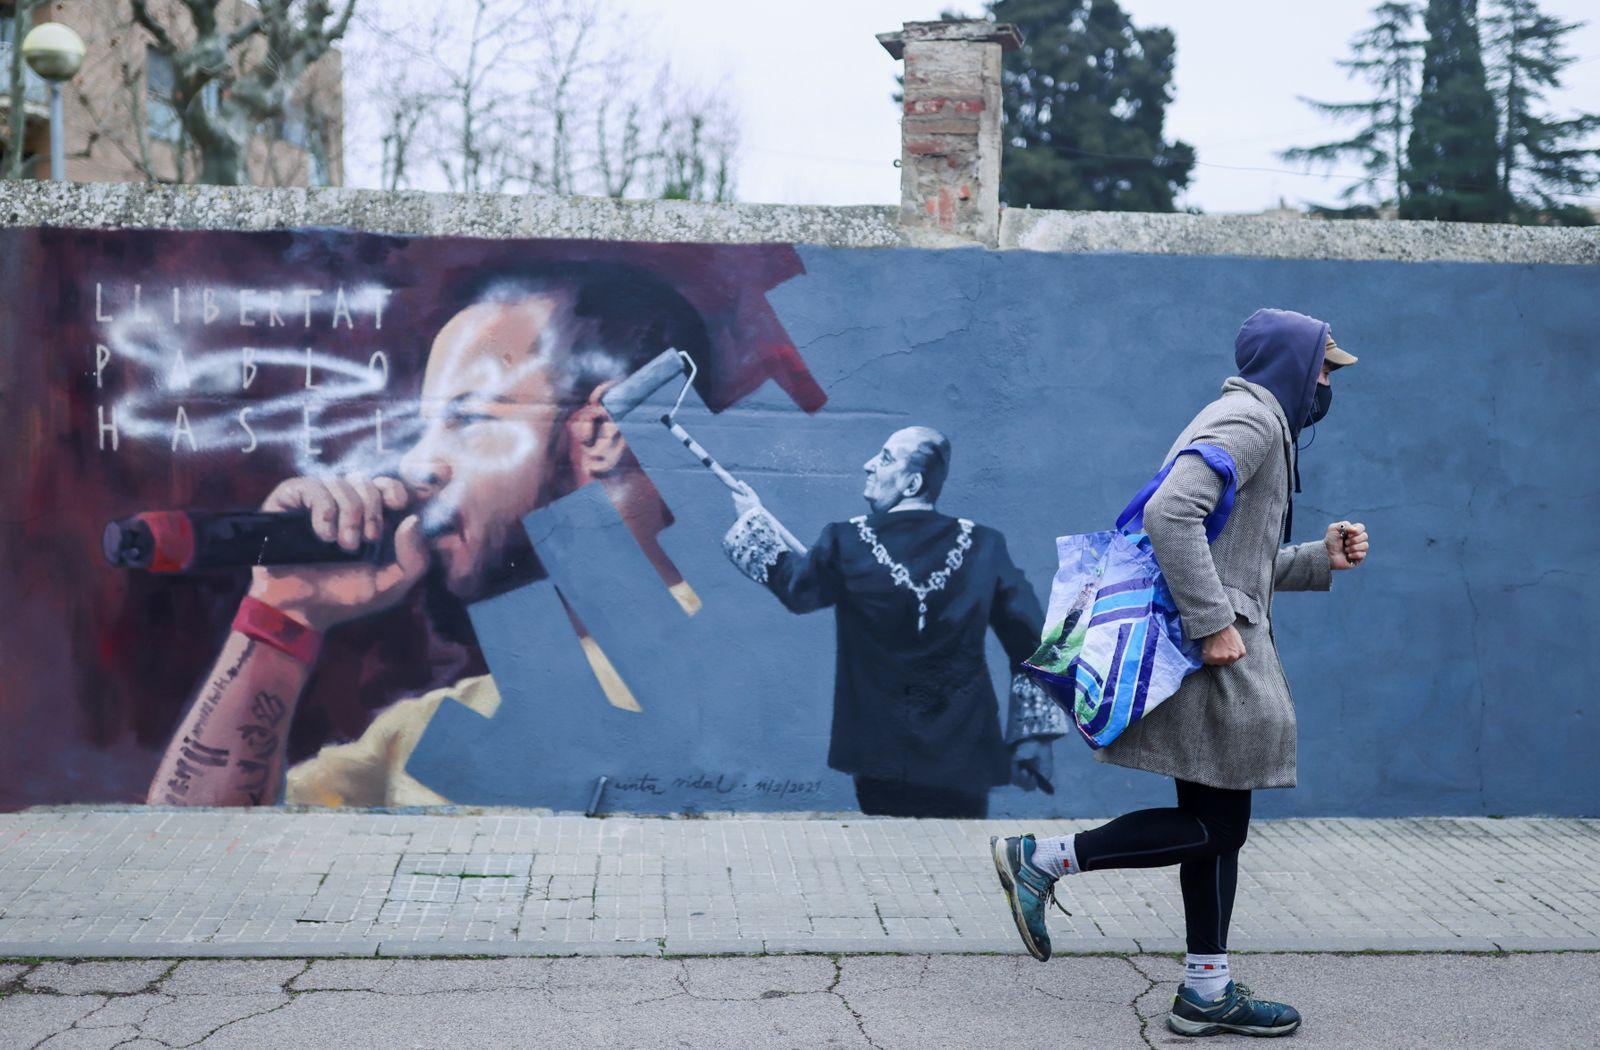 A person walks past a graffiti by Catalan artist Cinta Vidal in Cardedeu